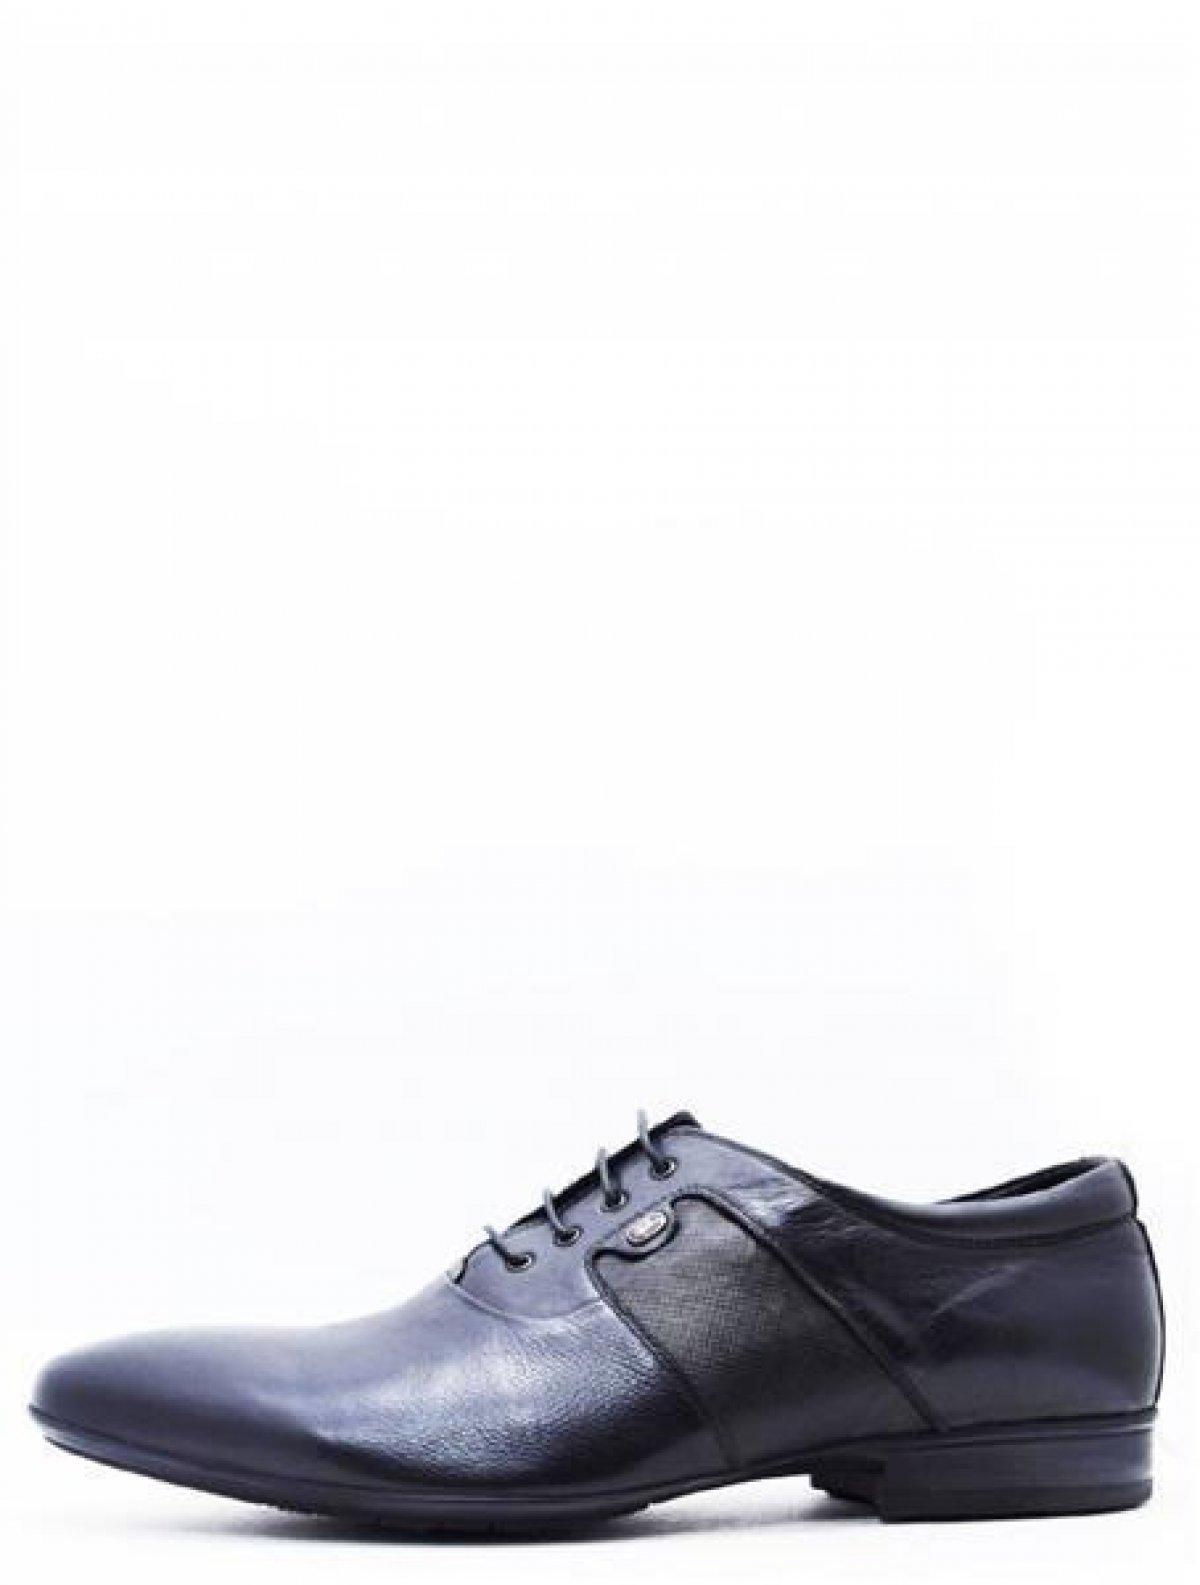 657248/02-01T туфли мужские